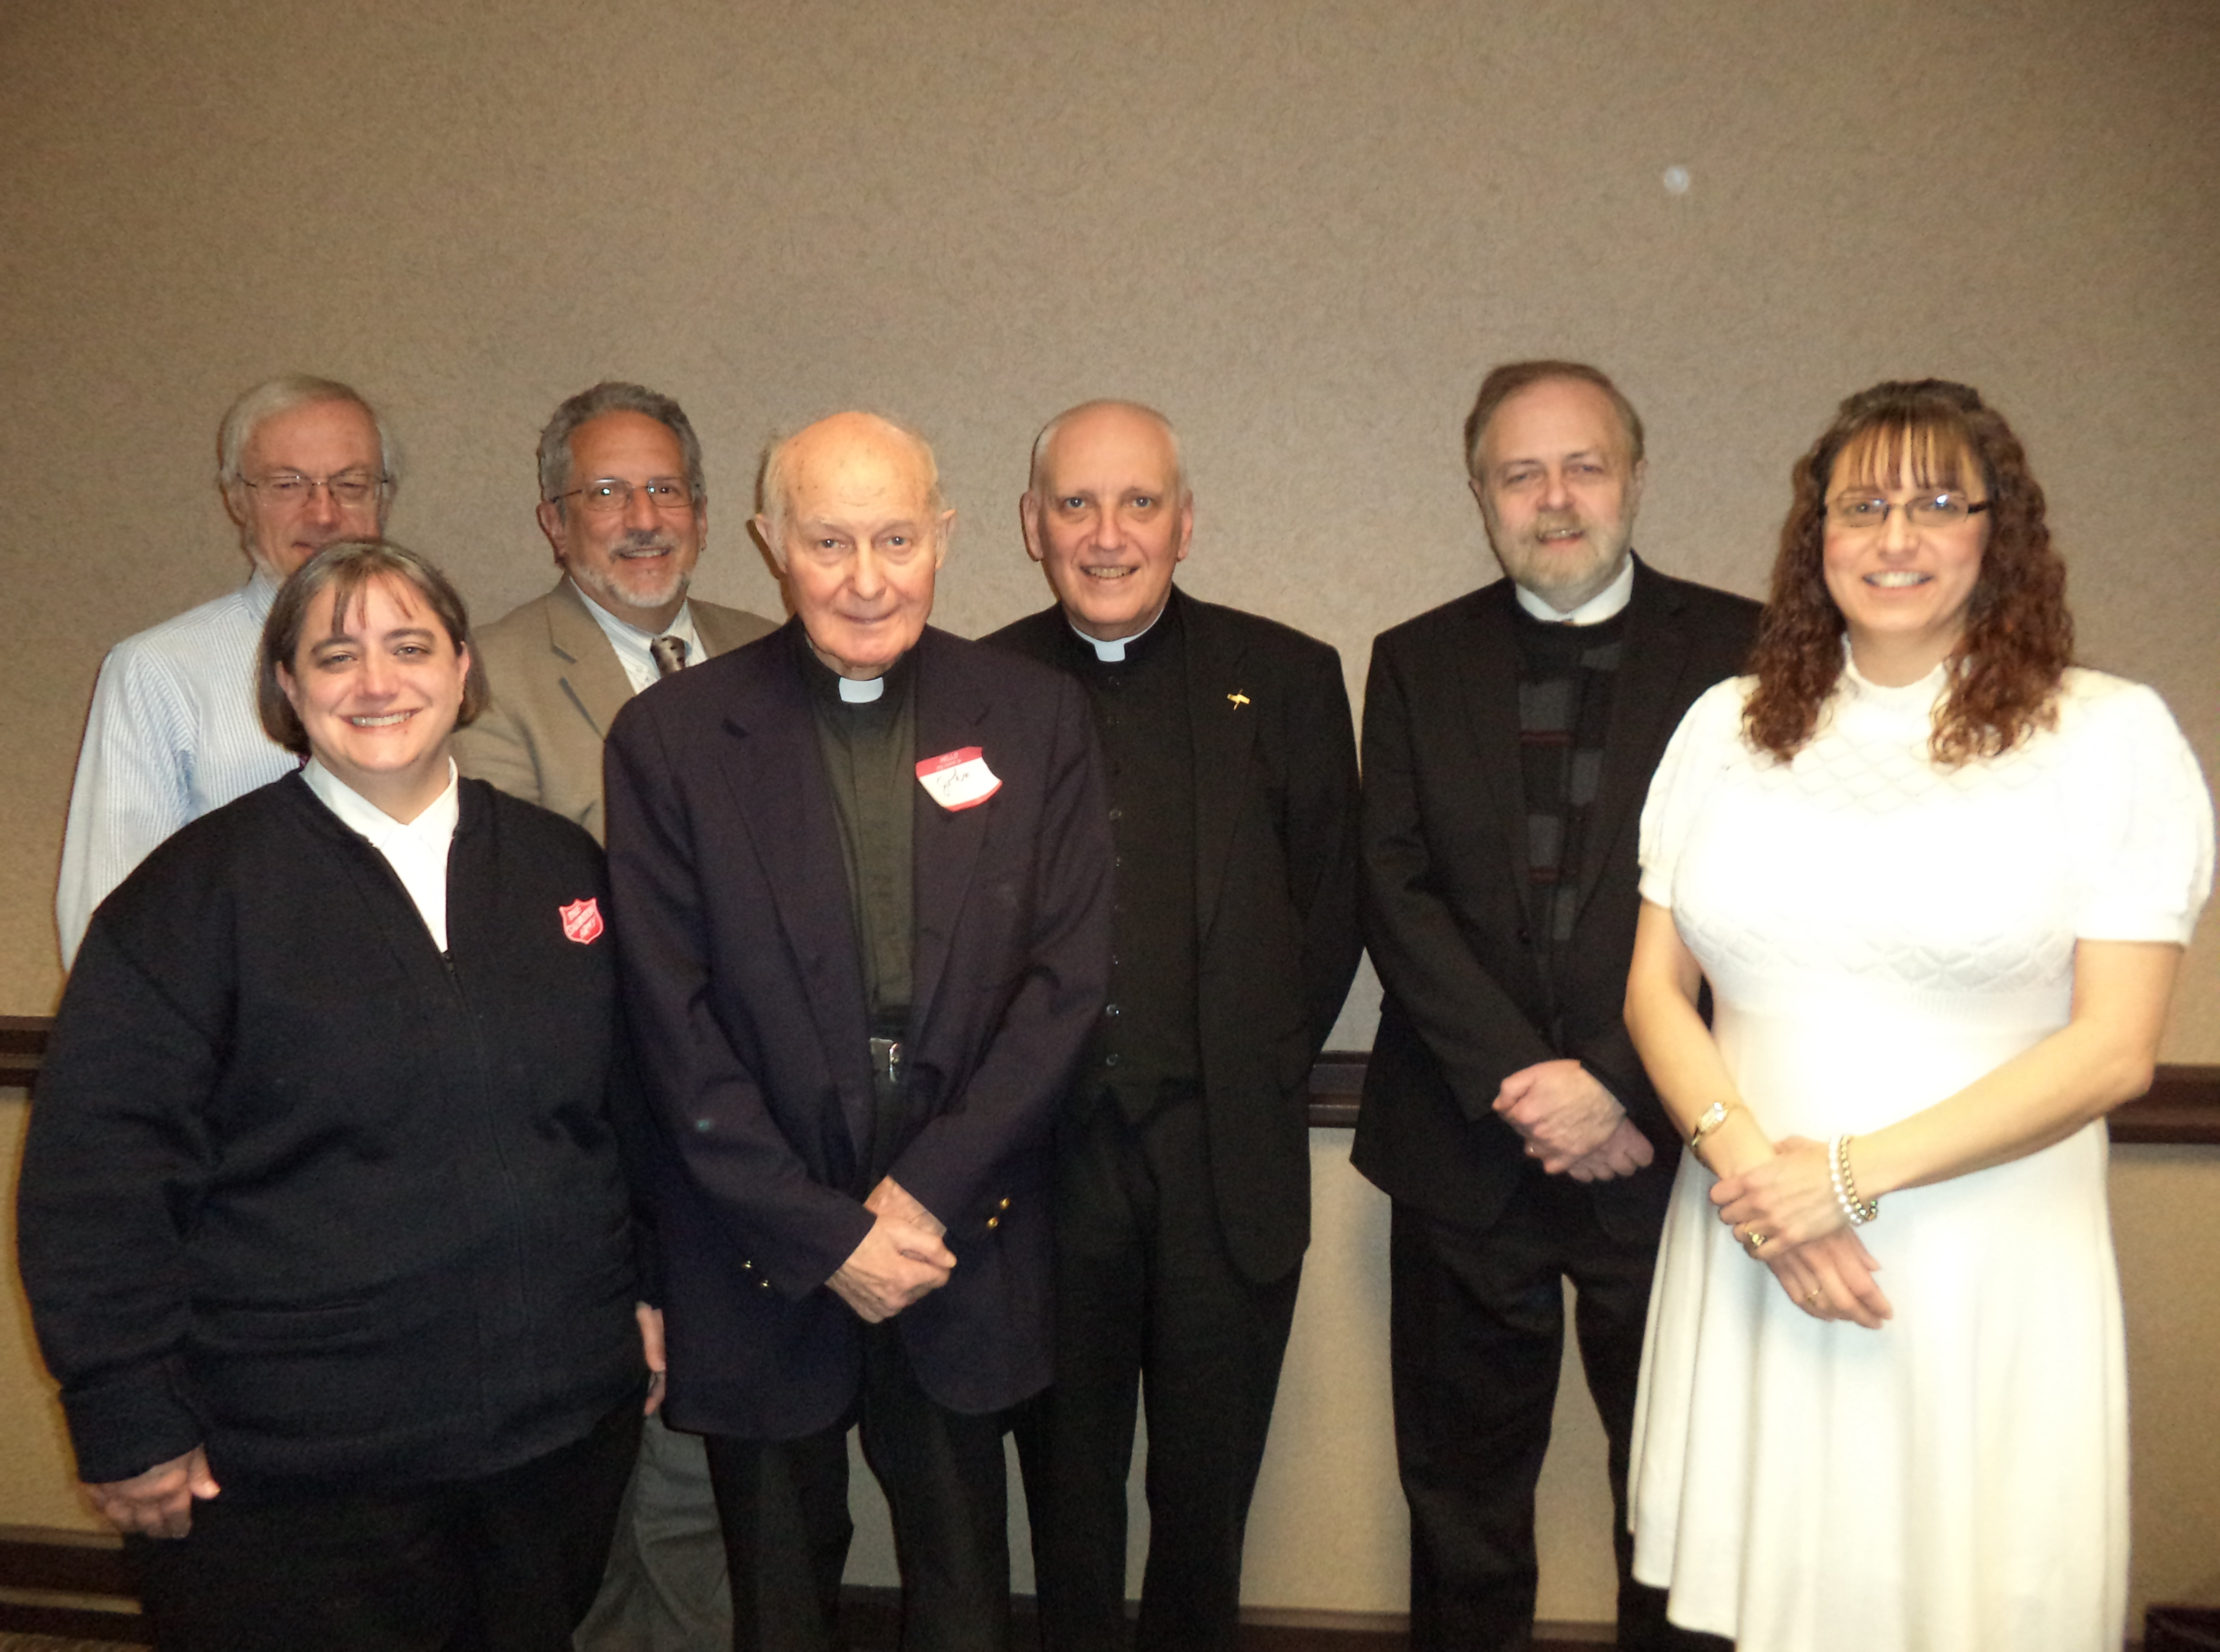 Clergy recognition program